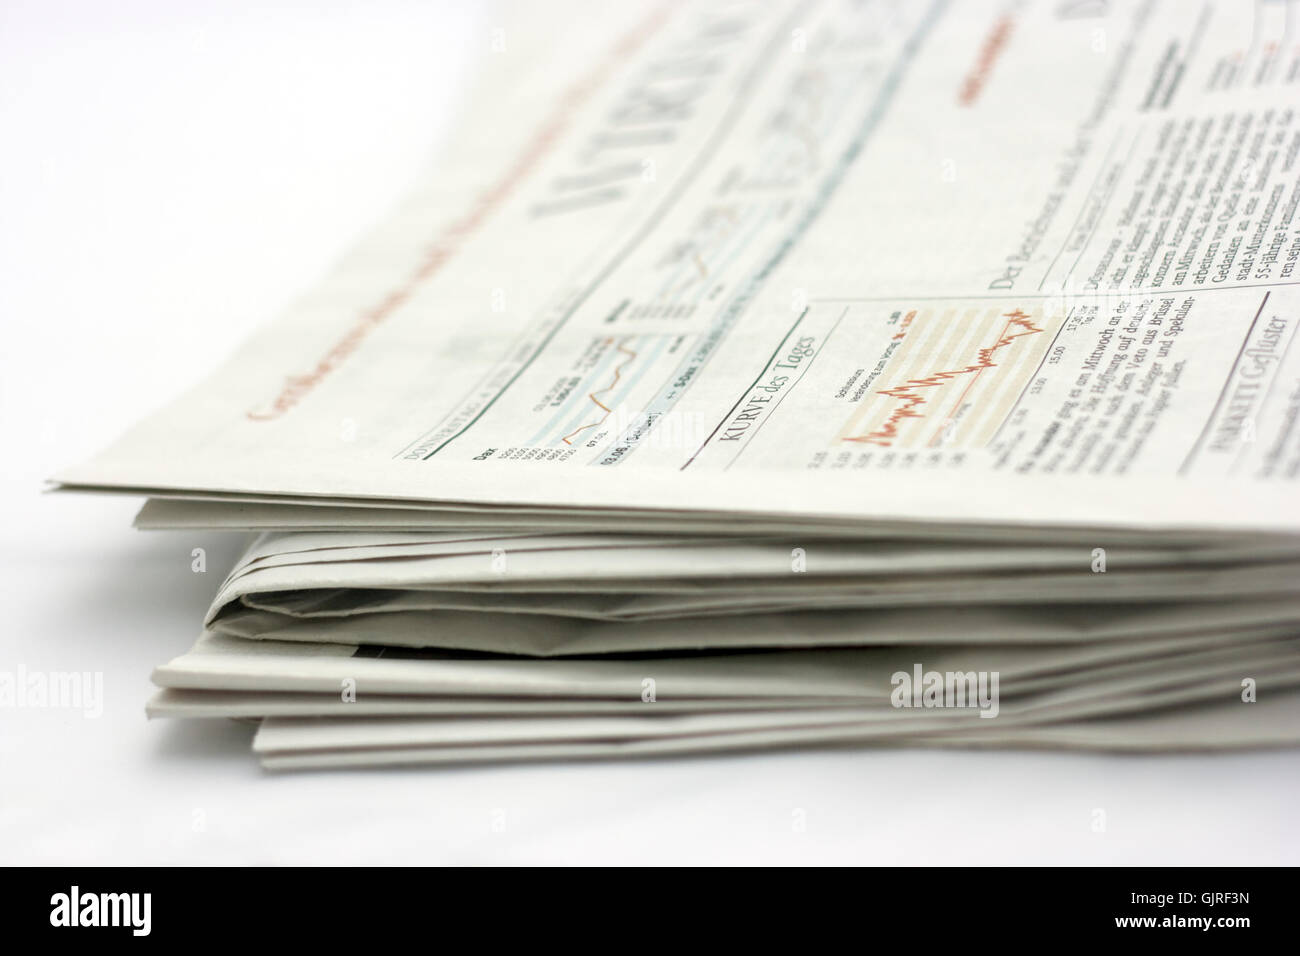 newspaper close up - Stock Image